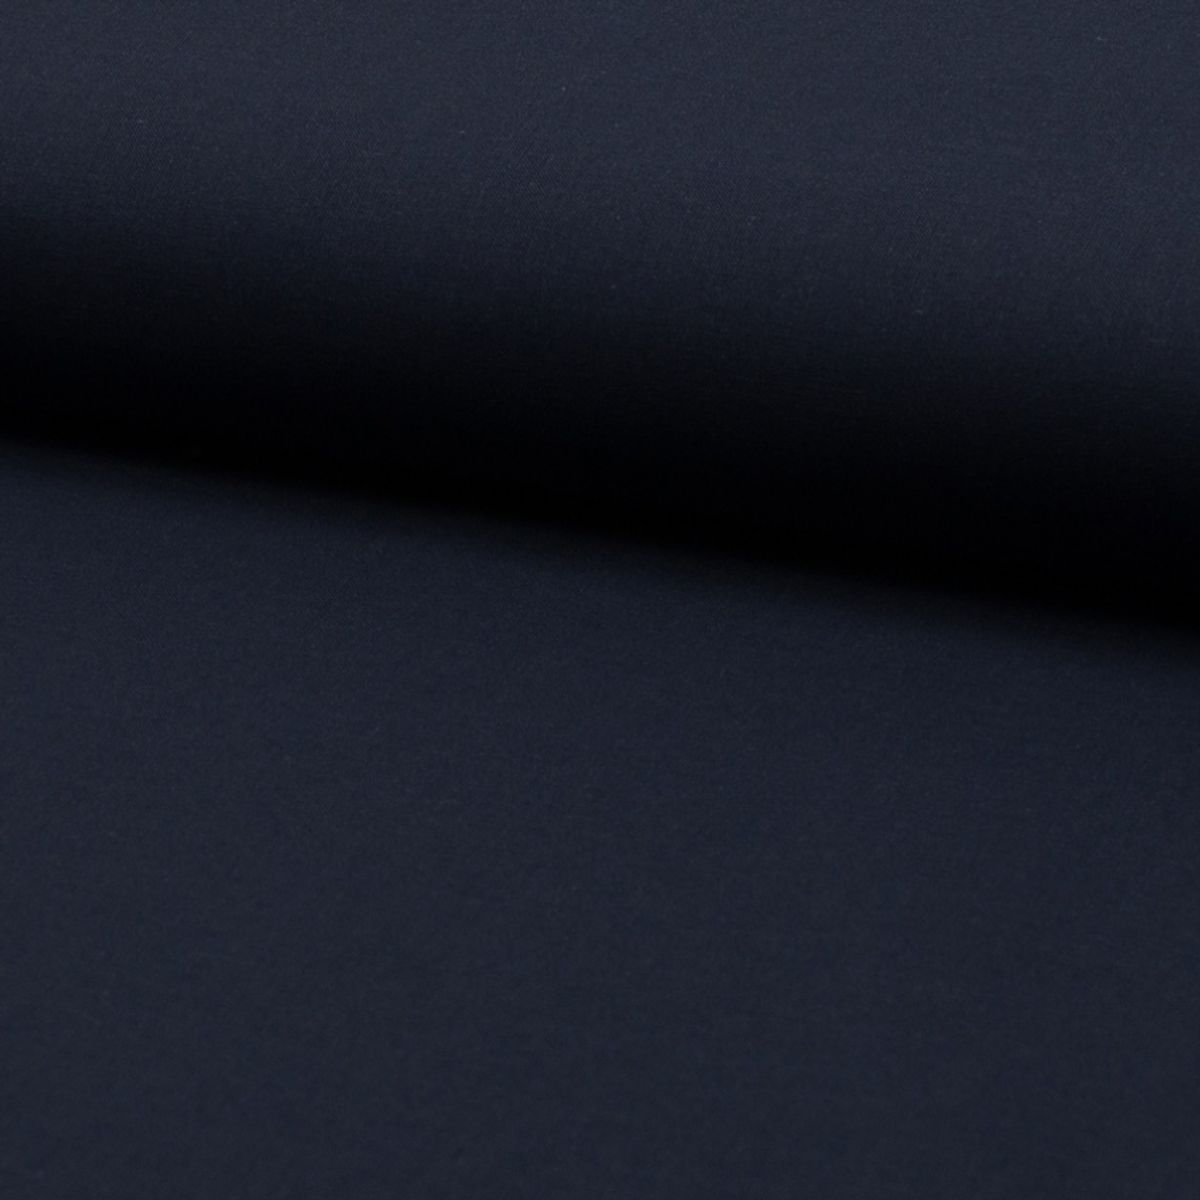 Tissu voile de coton - Bleu marine